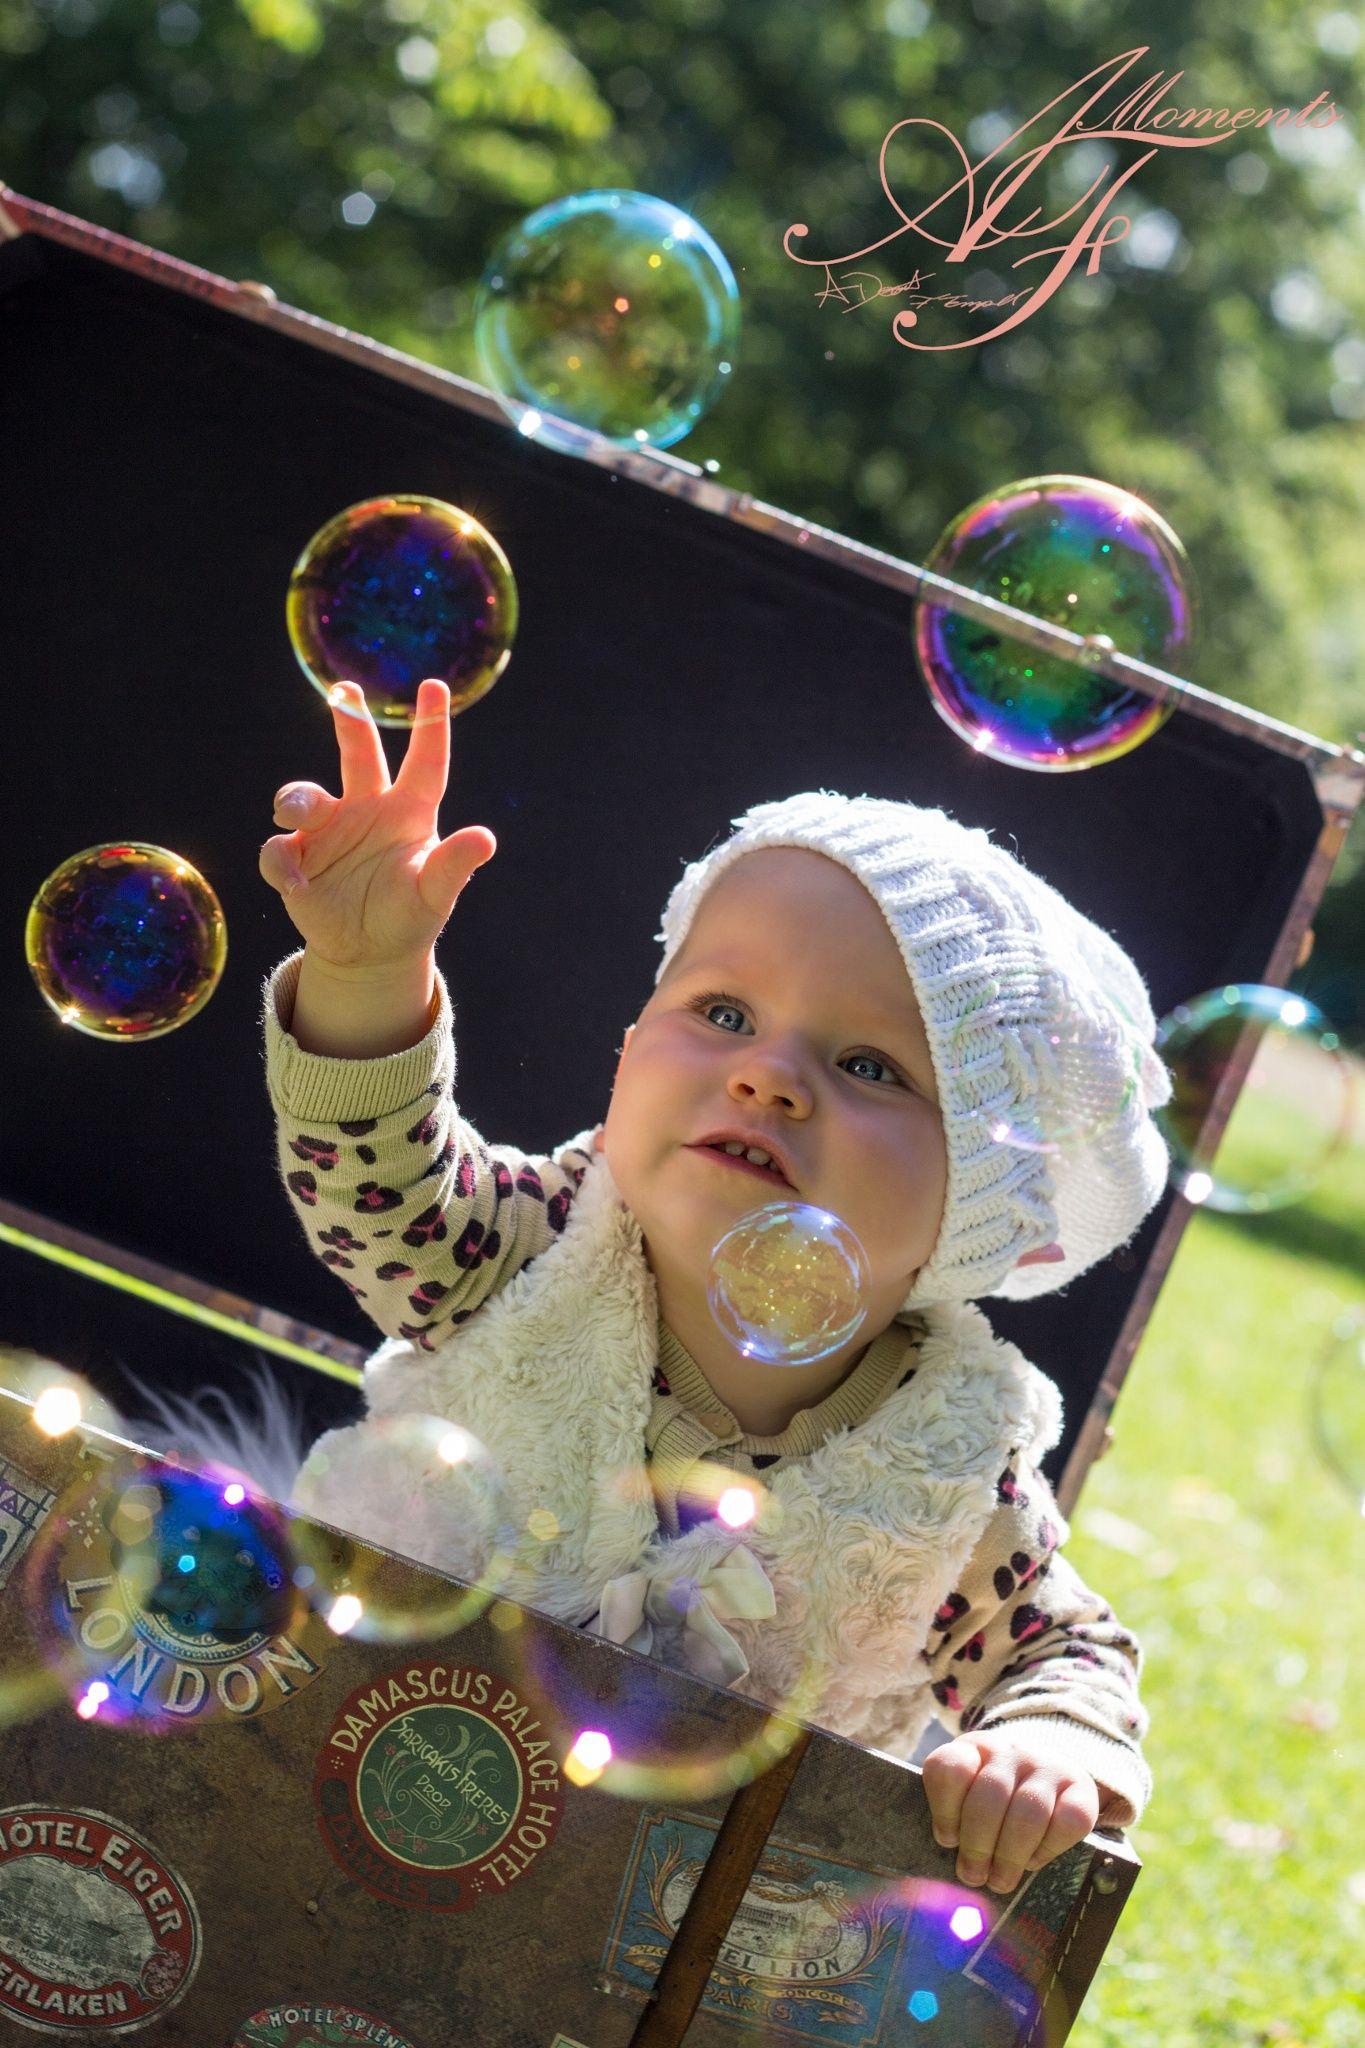 little Girl by Franzi Tempel on 500px